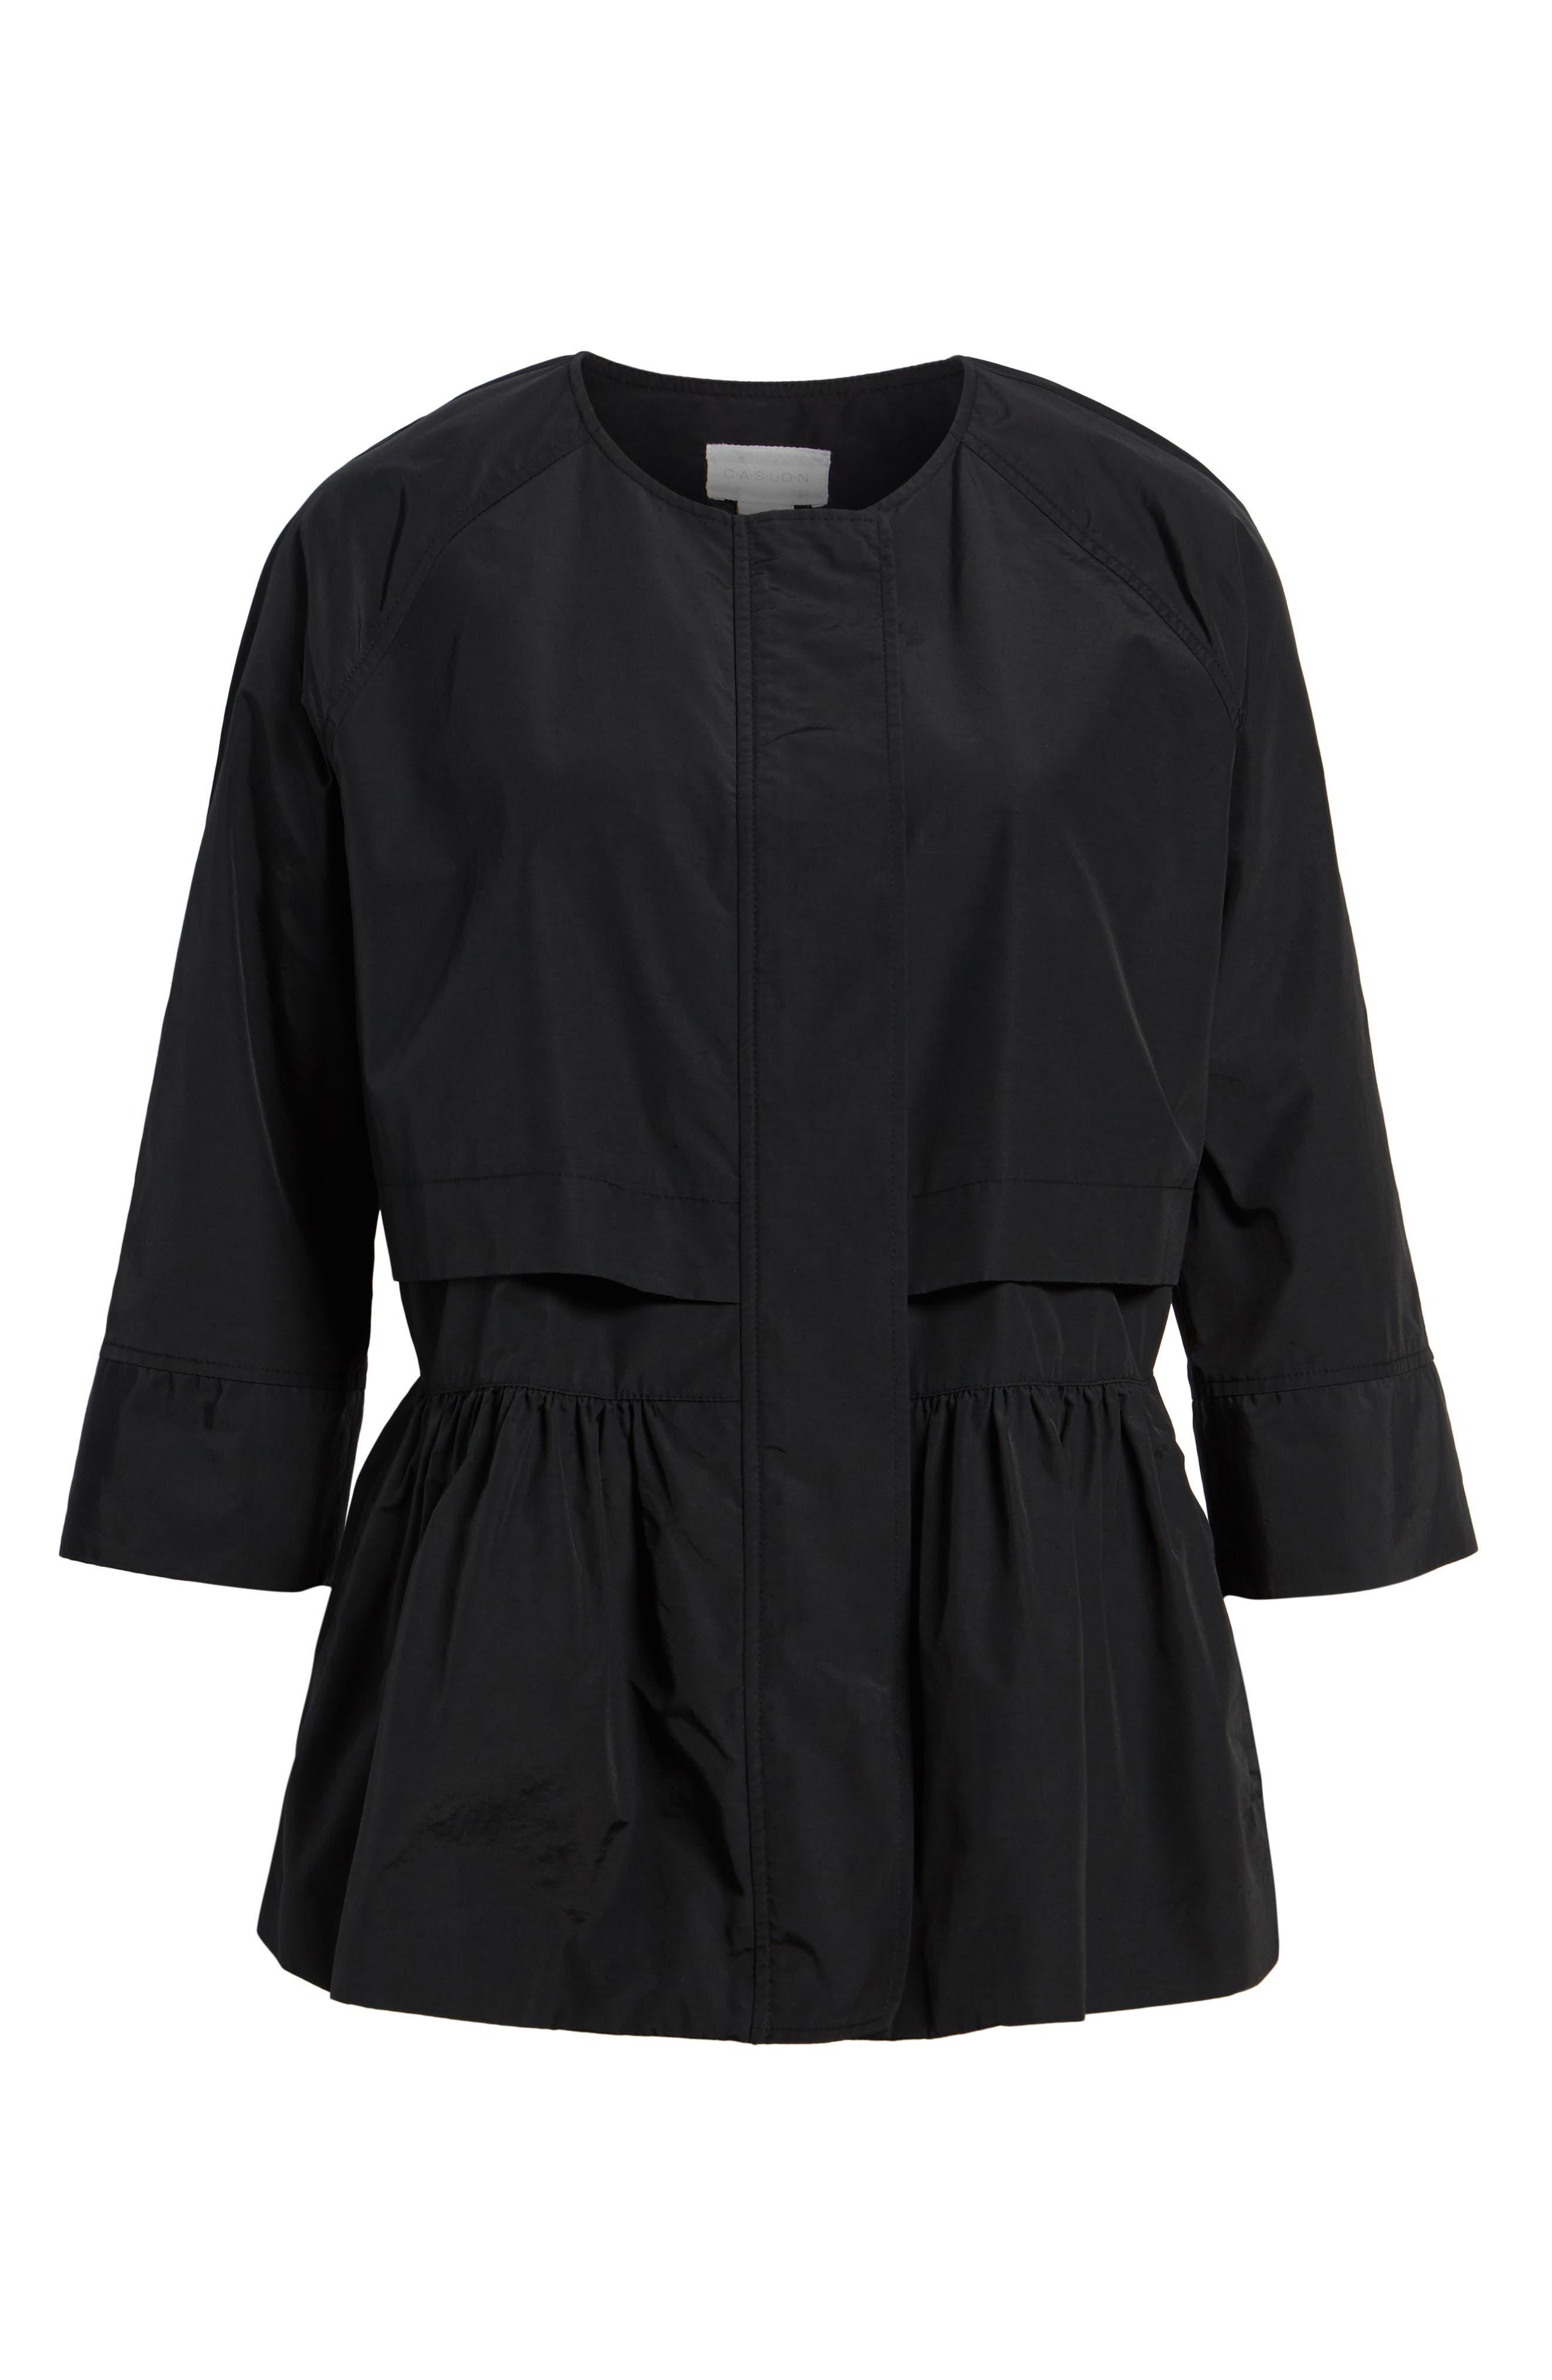 Peplum Cotton Blend Utility Jacket,                             Alternate thumbnail 6, color,                             001